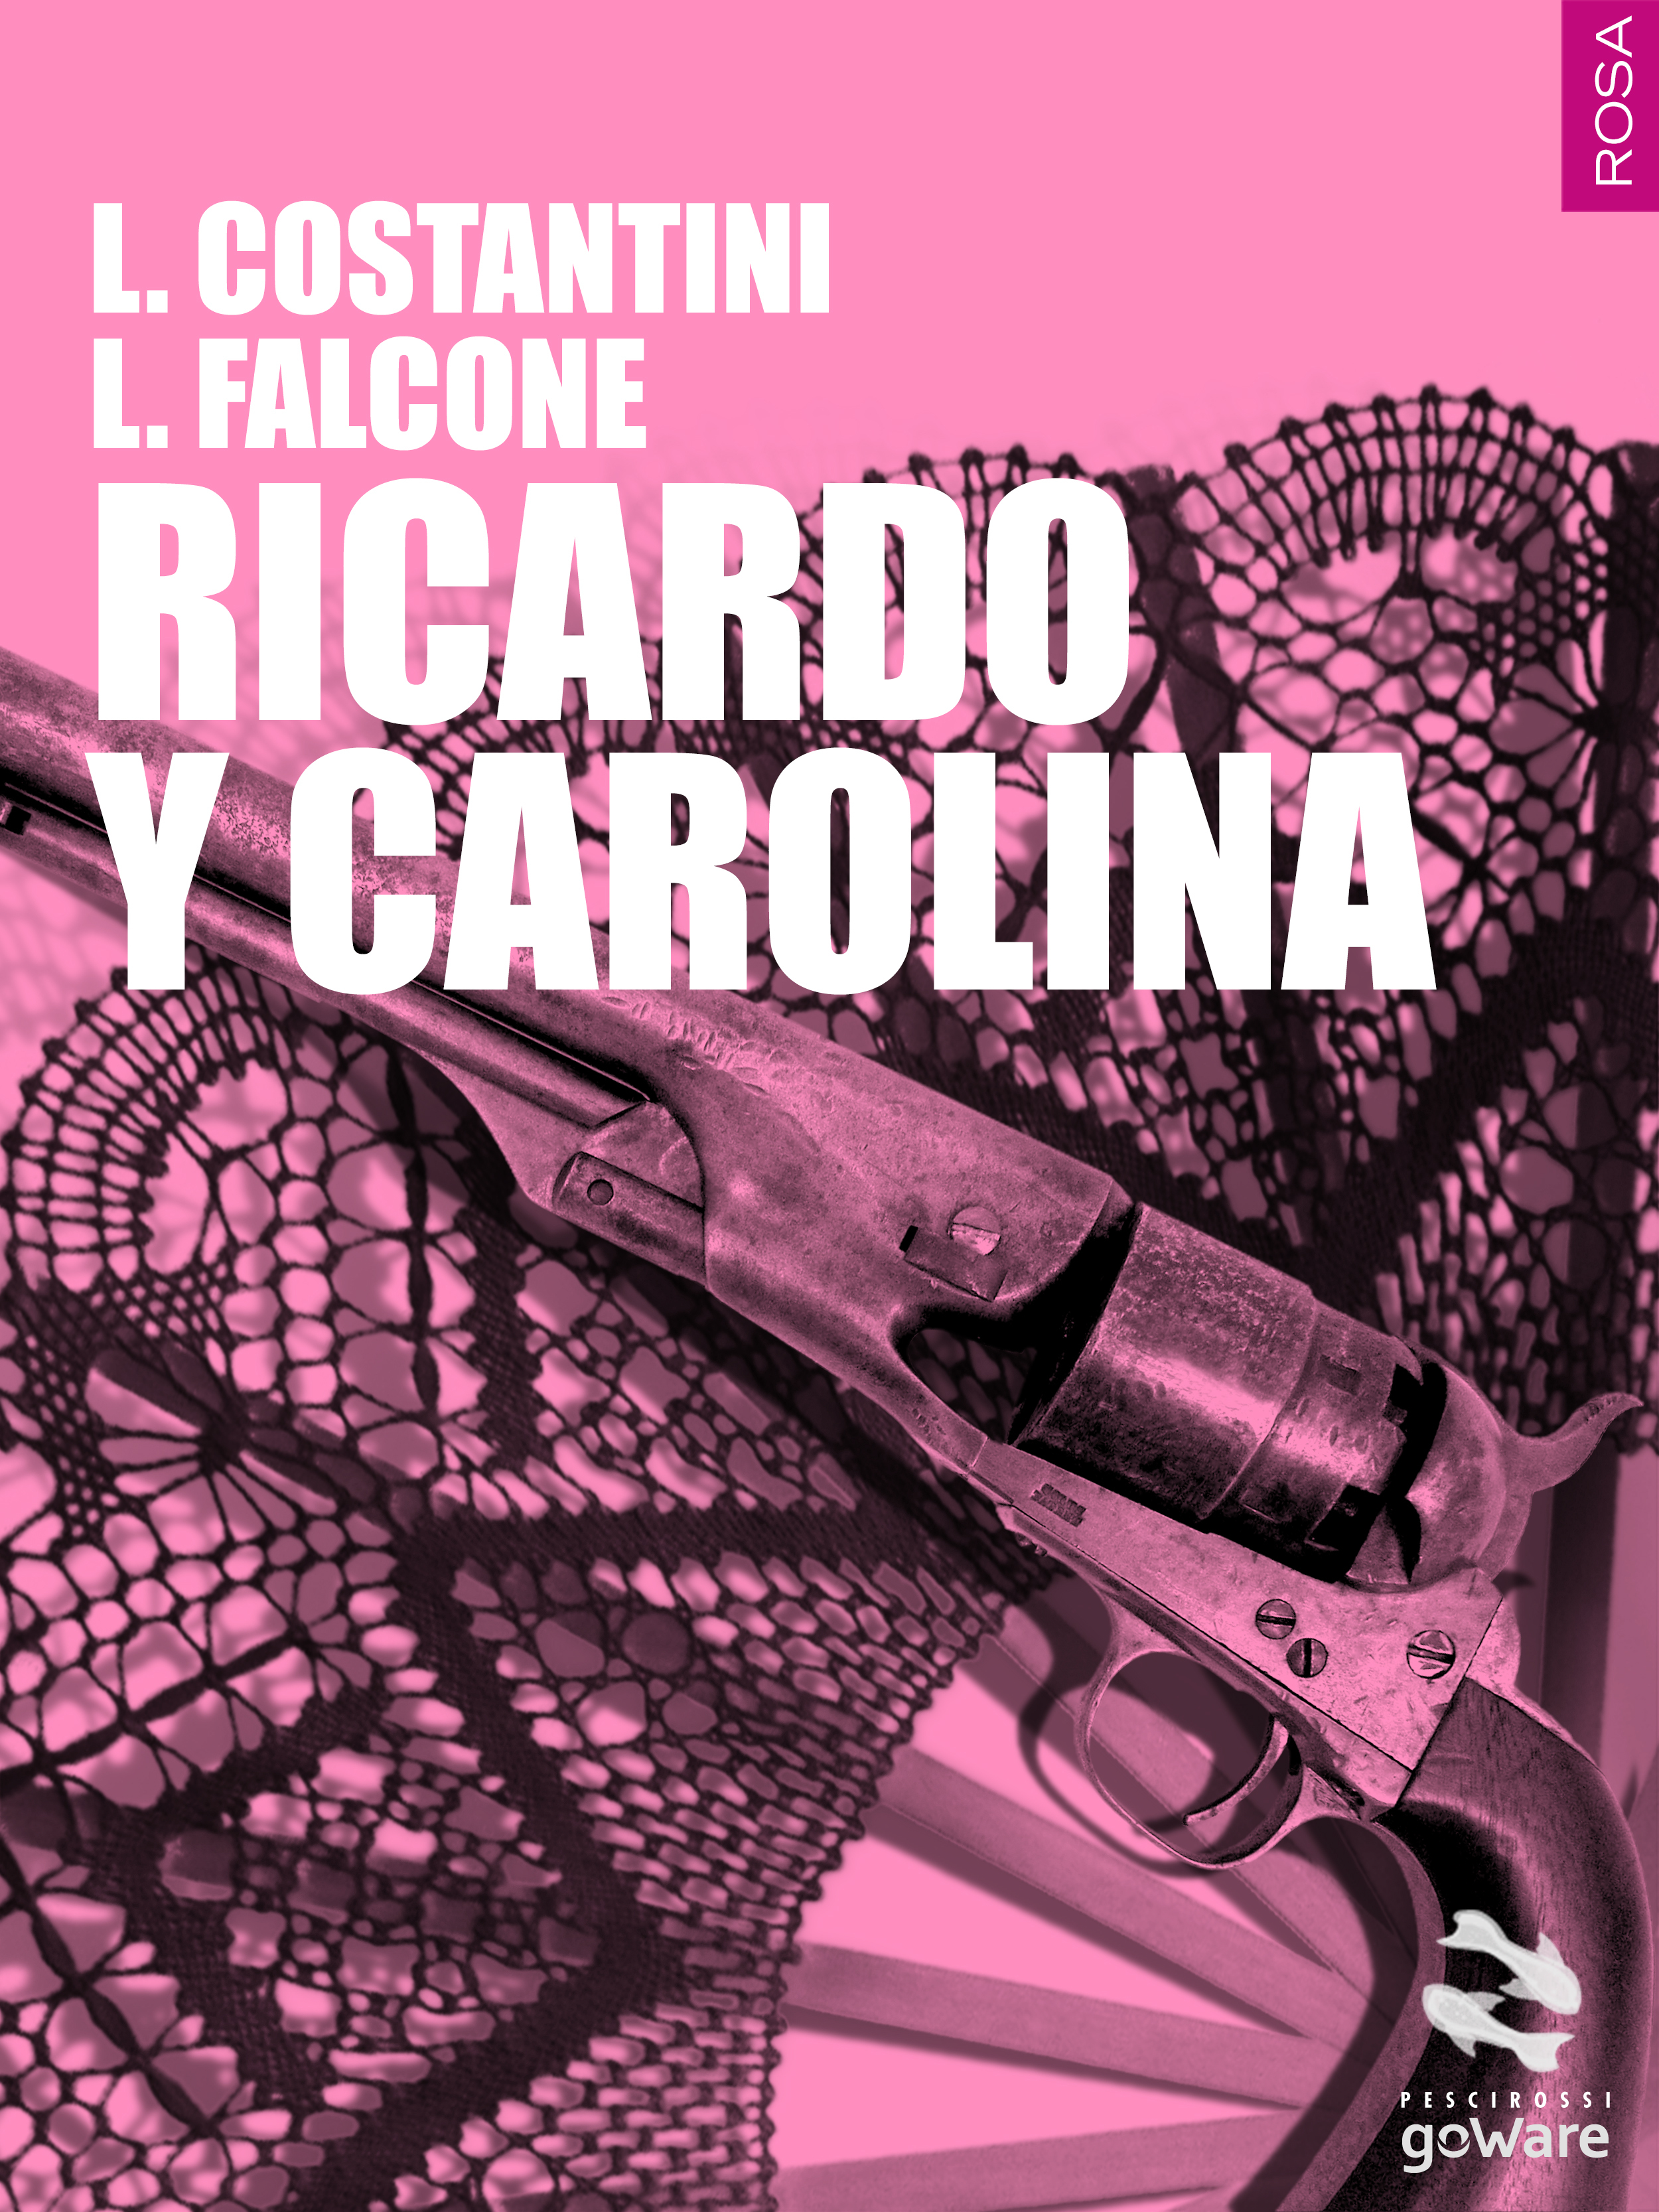 Ricardo y carolina Laura Costantini